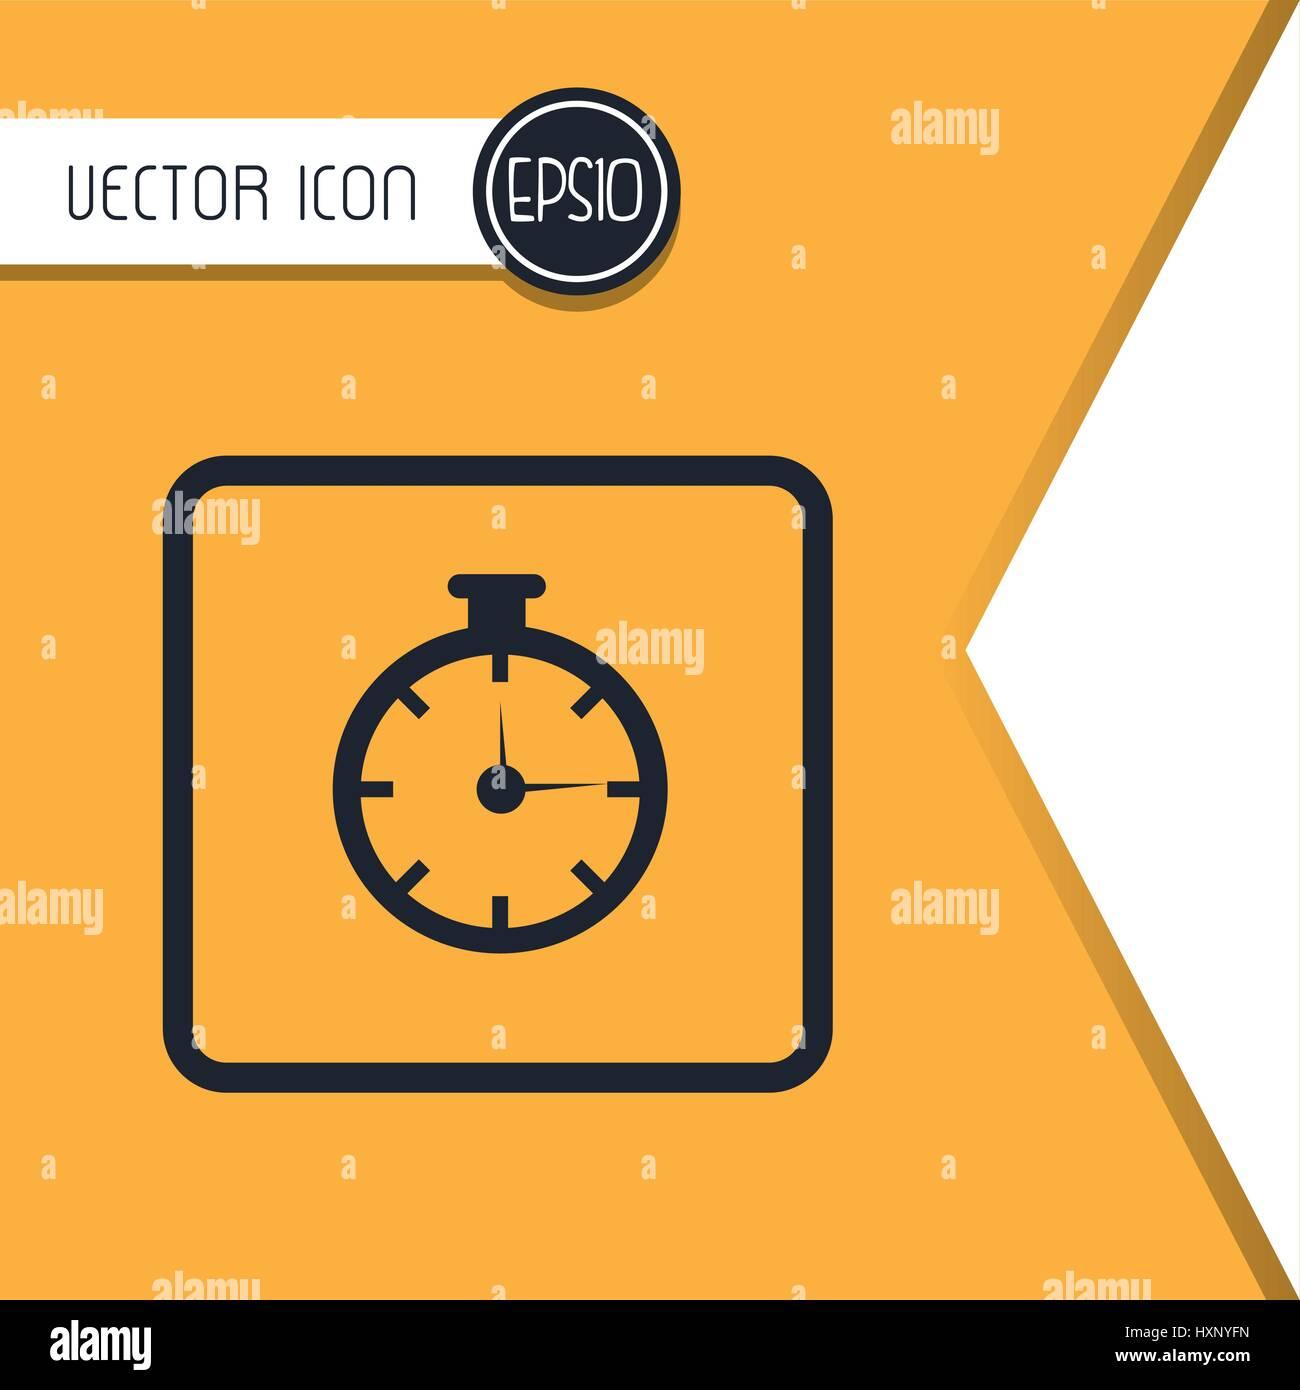 chronometer  icon design  - Stock Image